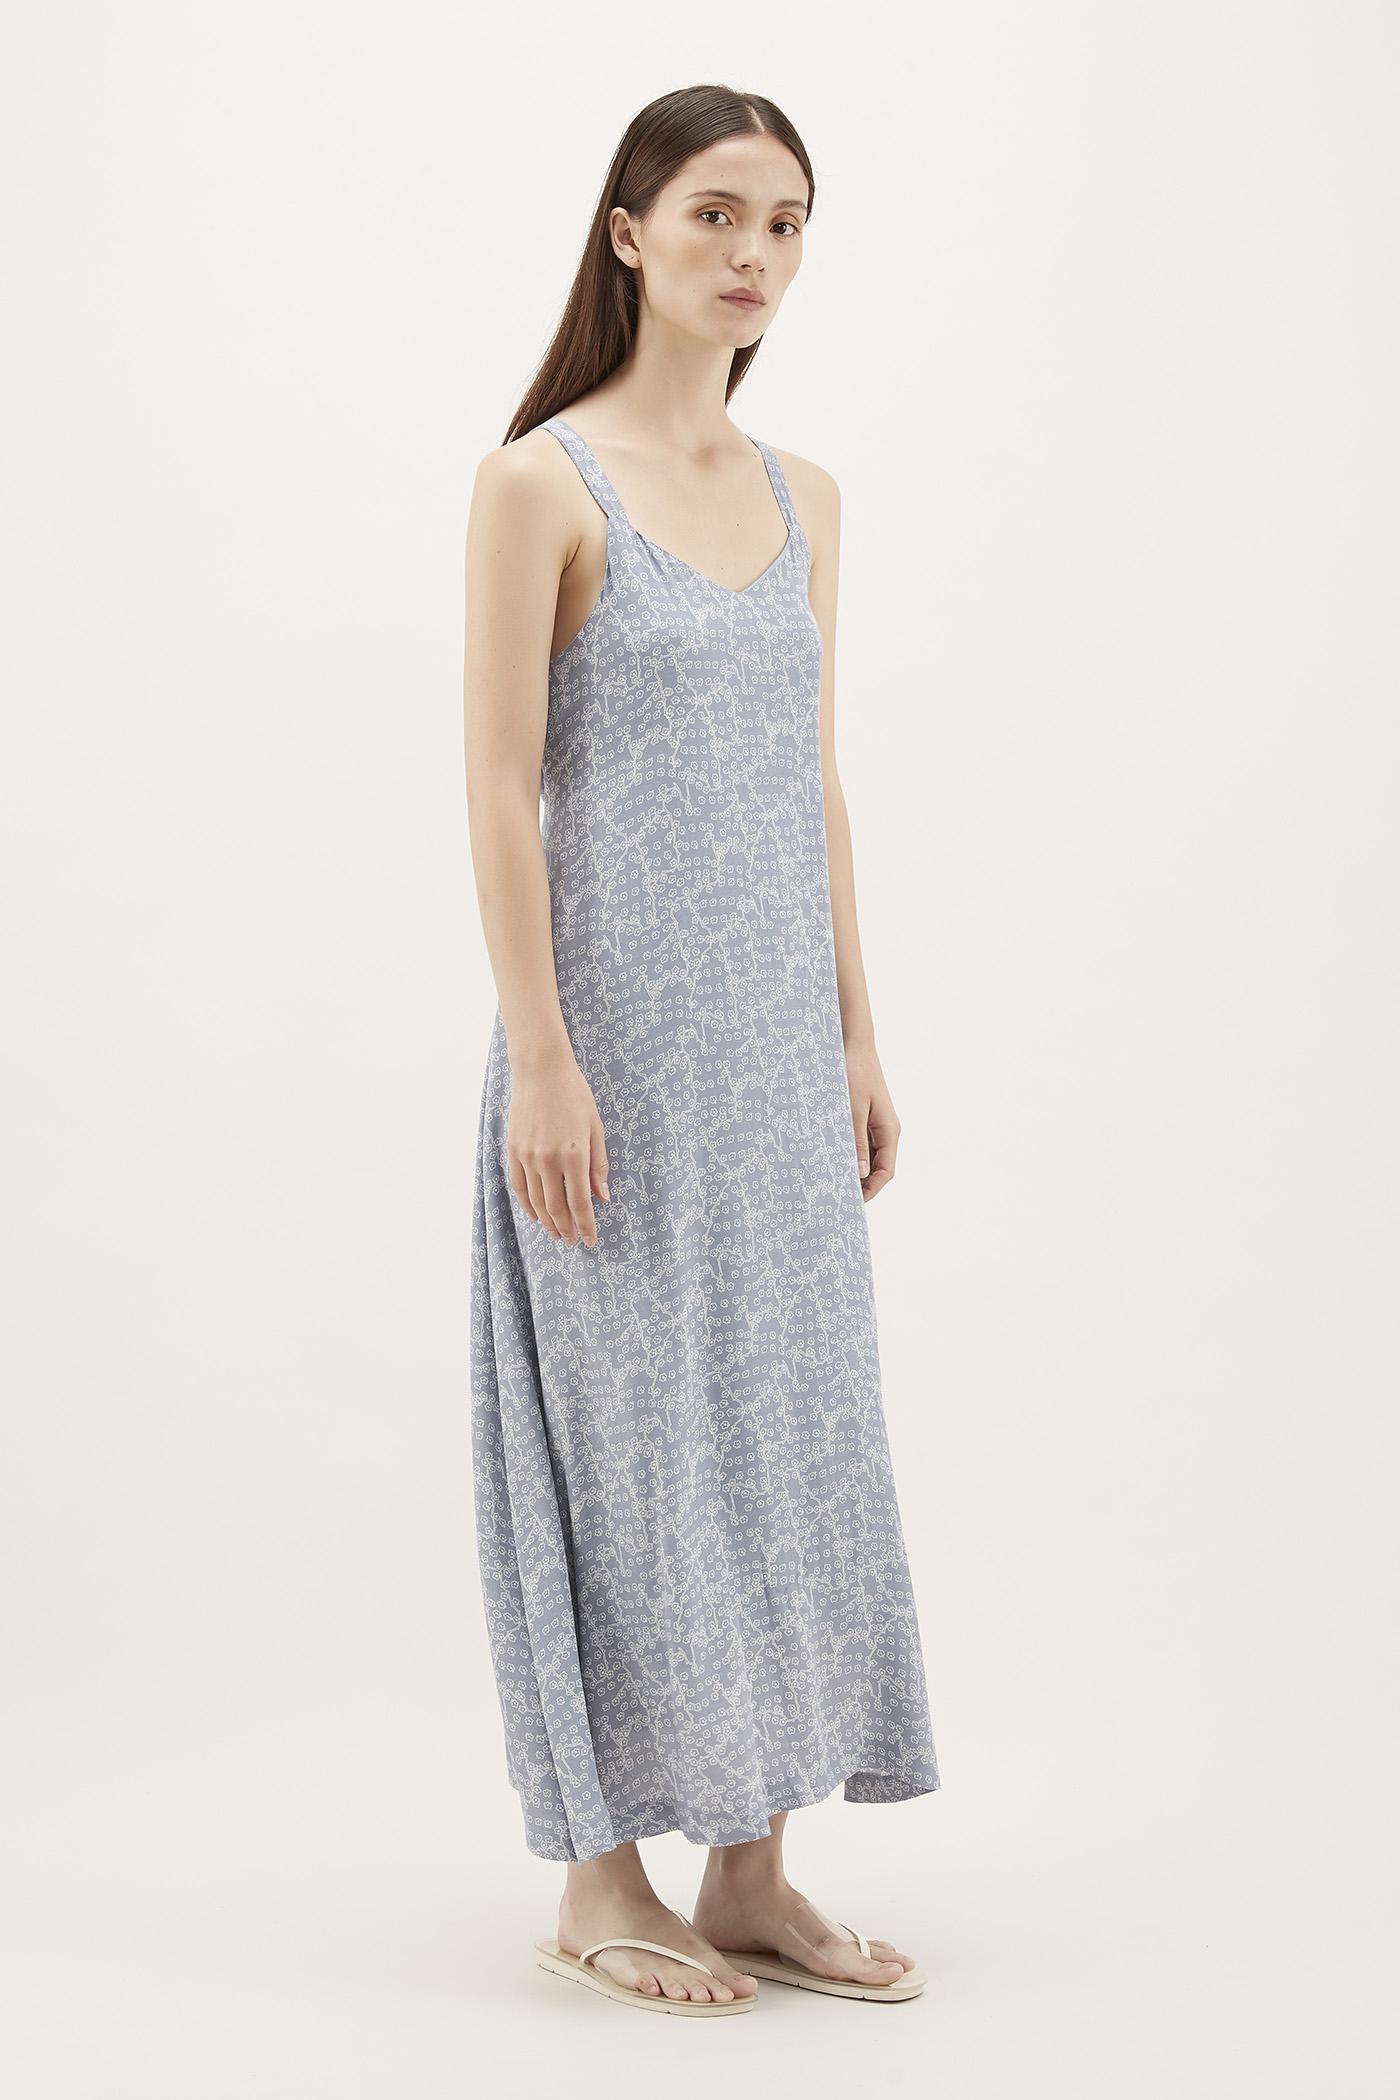 Persis Swing Dress